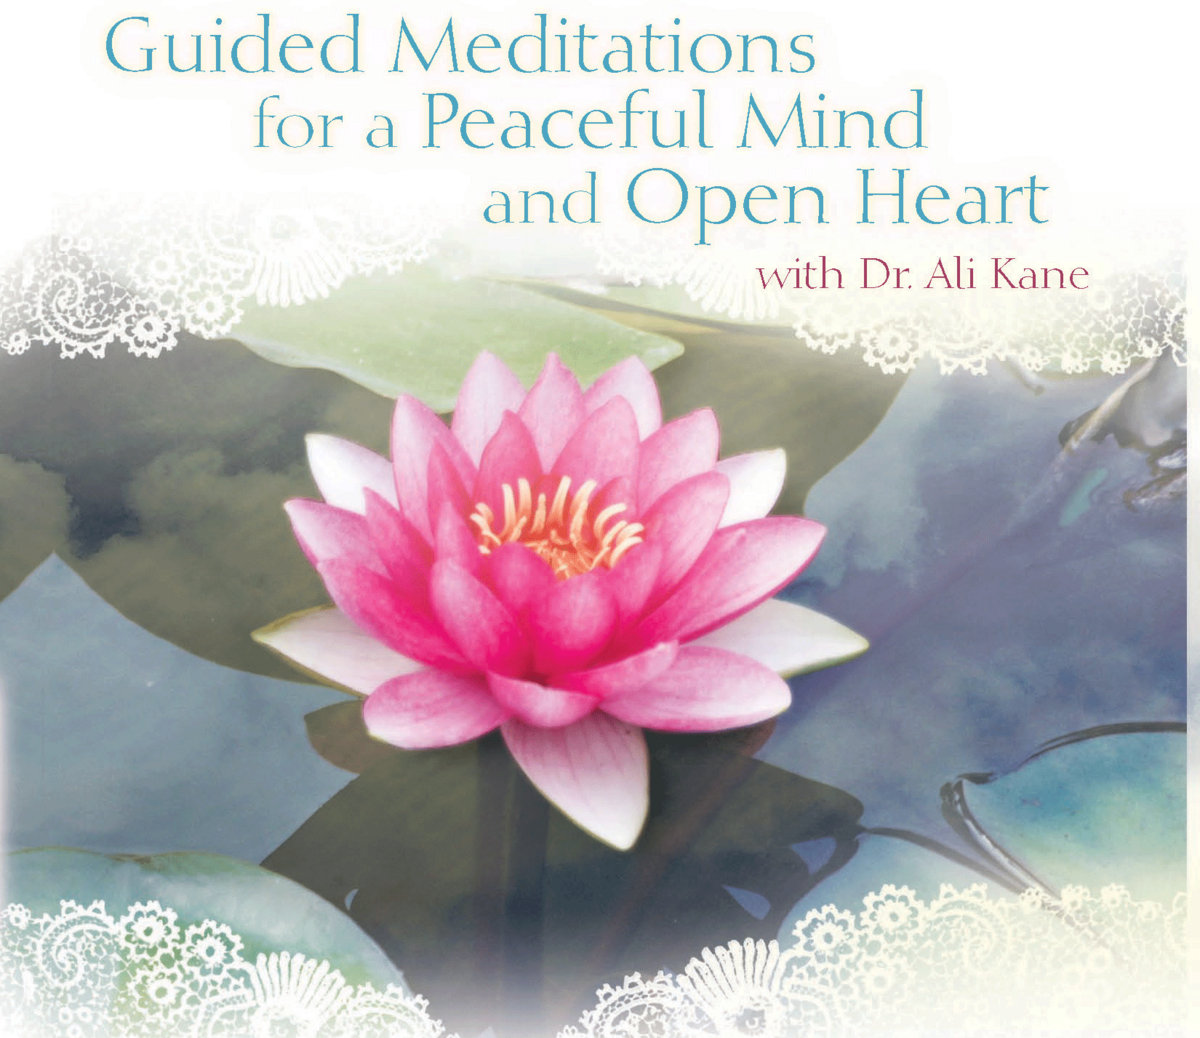 open heart guided meditation script